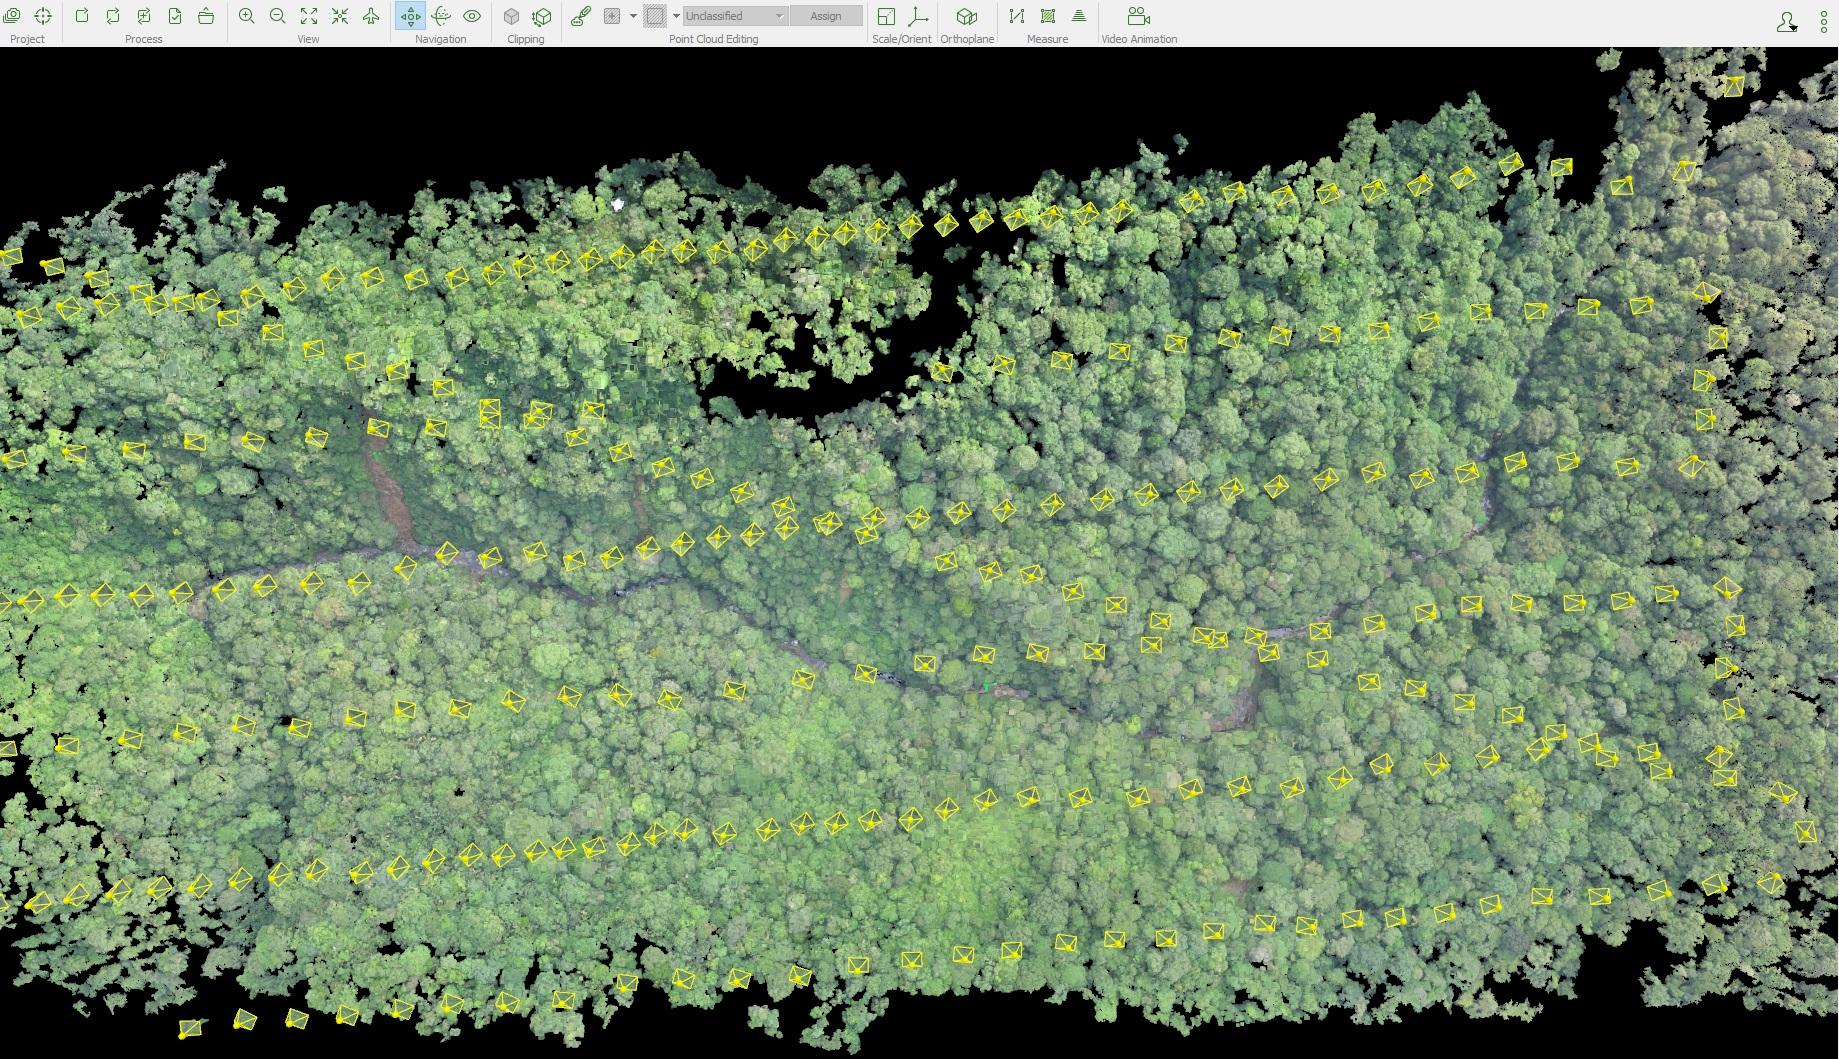 pix4d-pix4dmapper-environmental-monitoring-spider-monkey-ecuador-results-pointcloud-2